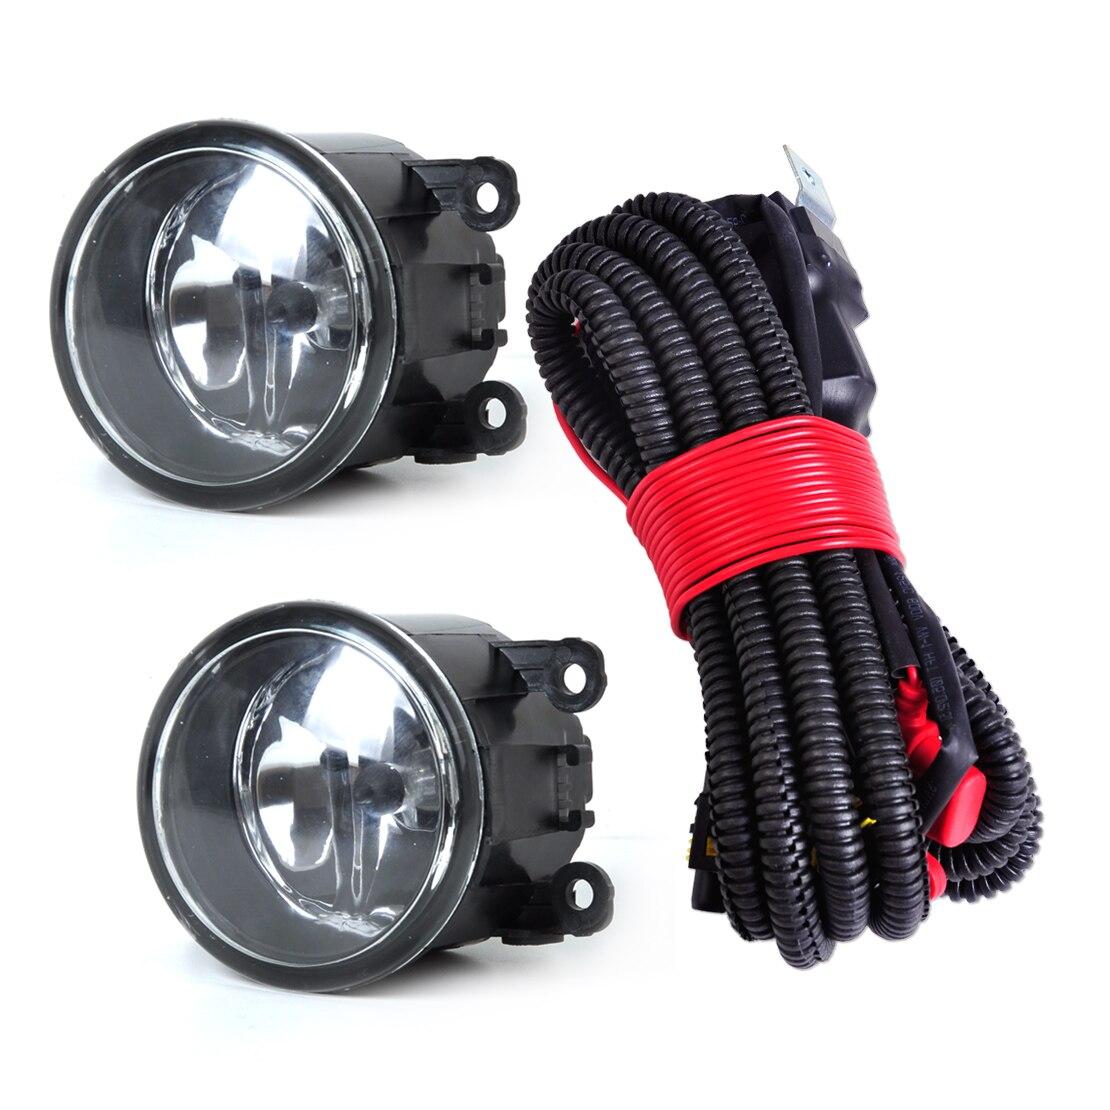 2003 Ford Ranger Fog Light Wire Harness Schematics Wiring Diagrams 2010 Edge Diagram U2022 Rh Parntesis Co 2011 Lights 1999